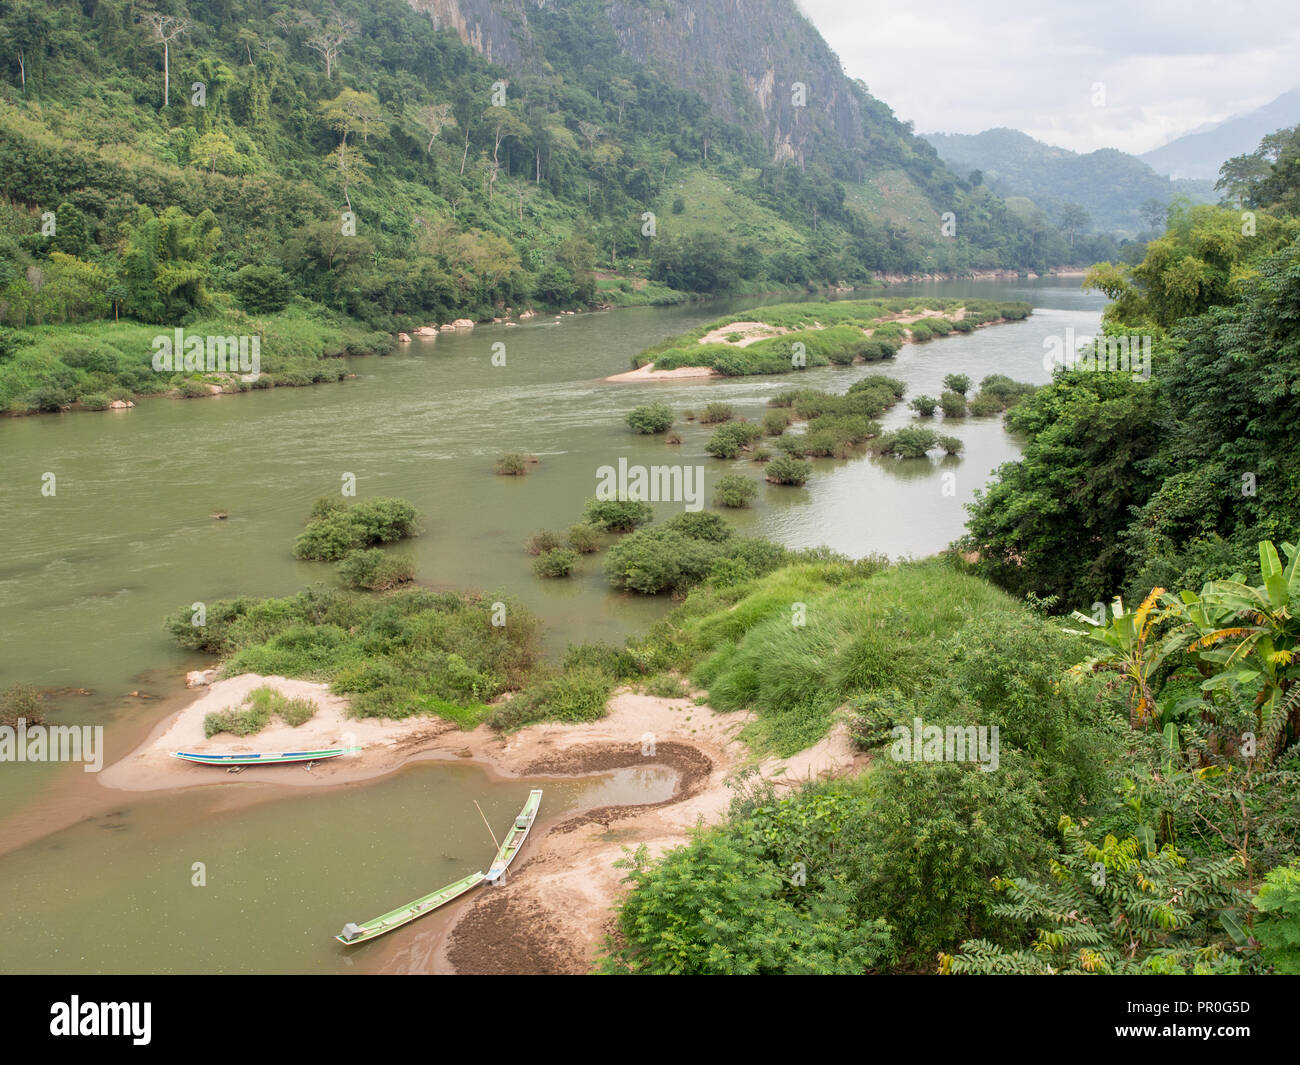 Nam Ou Fluss, Nong Khiaw, Laos, Indochina, Südostasien, Asien Stockbild